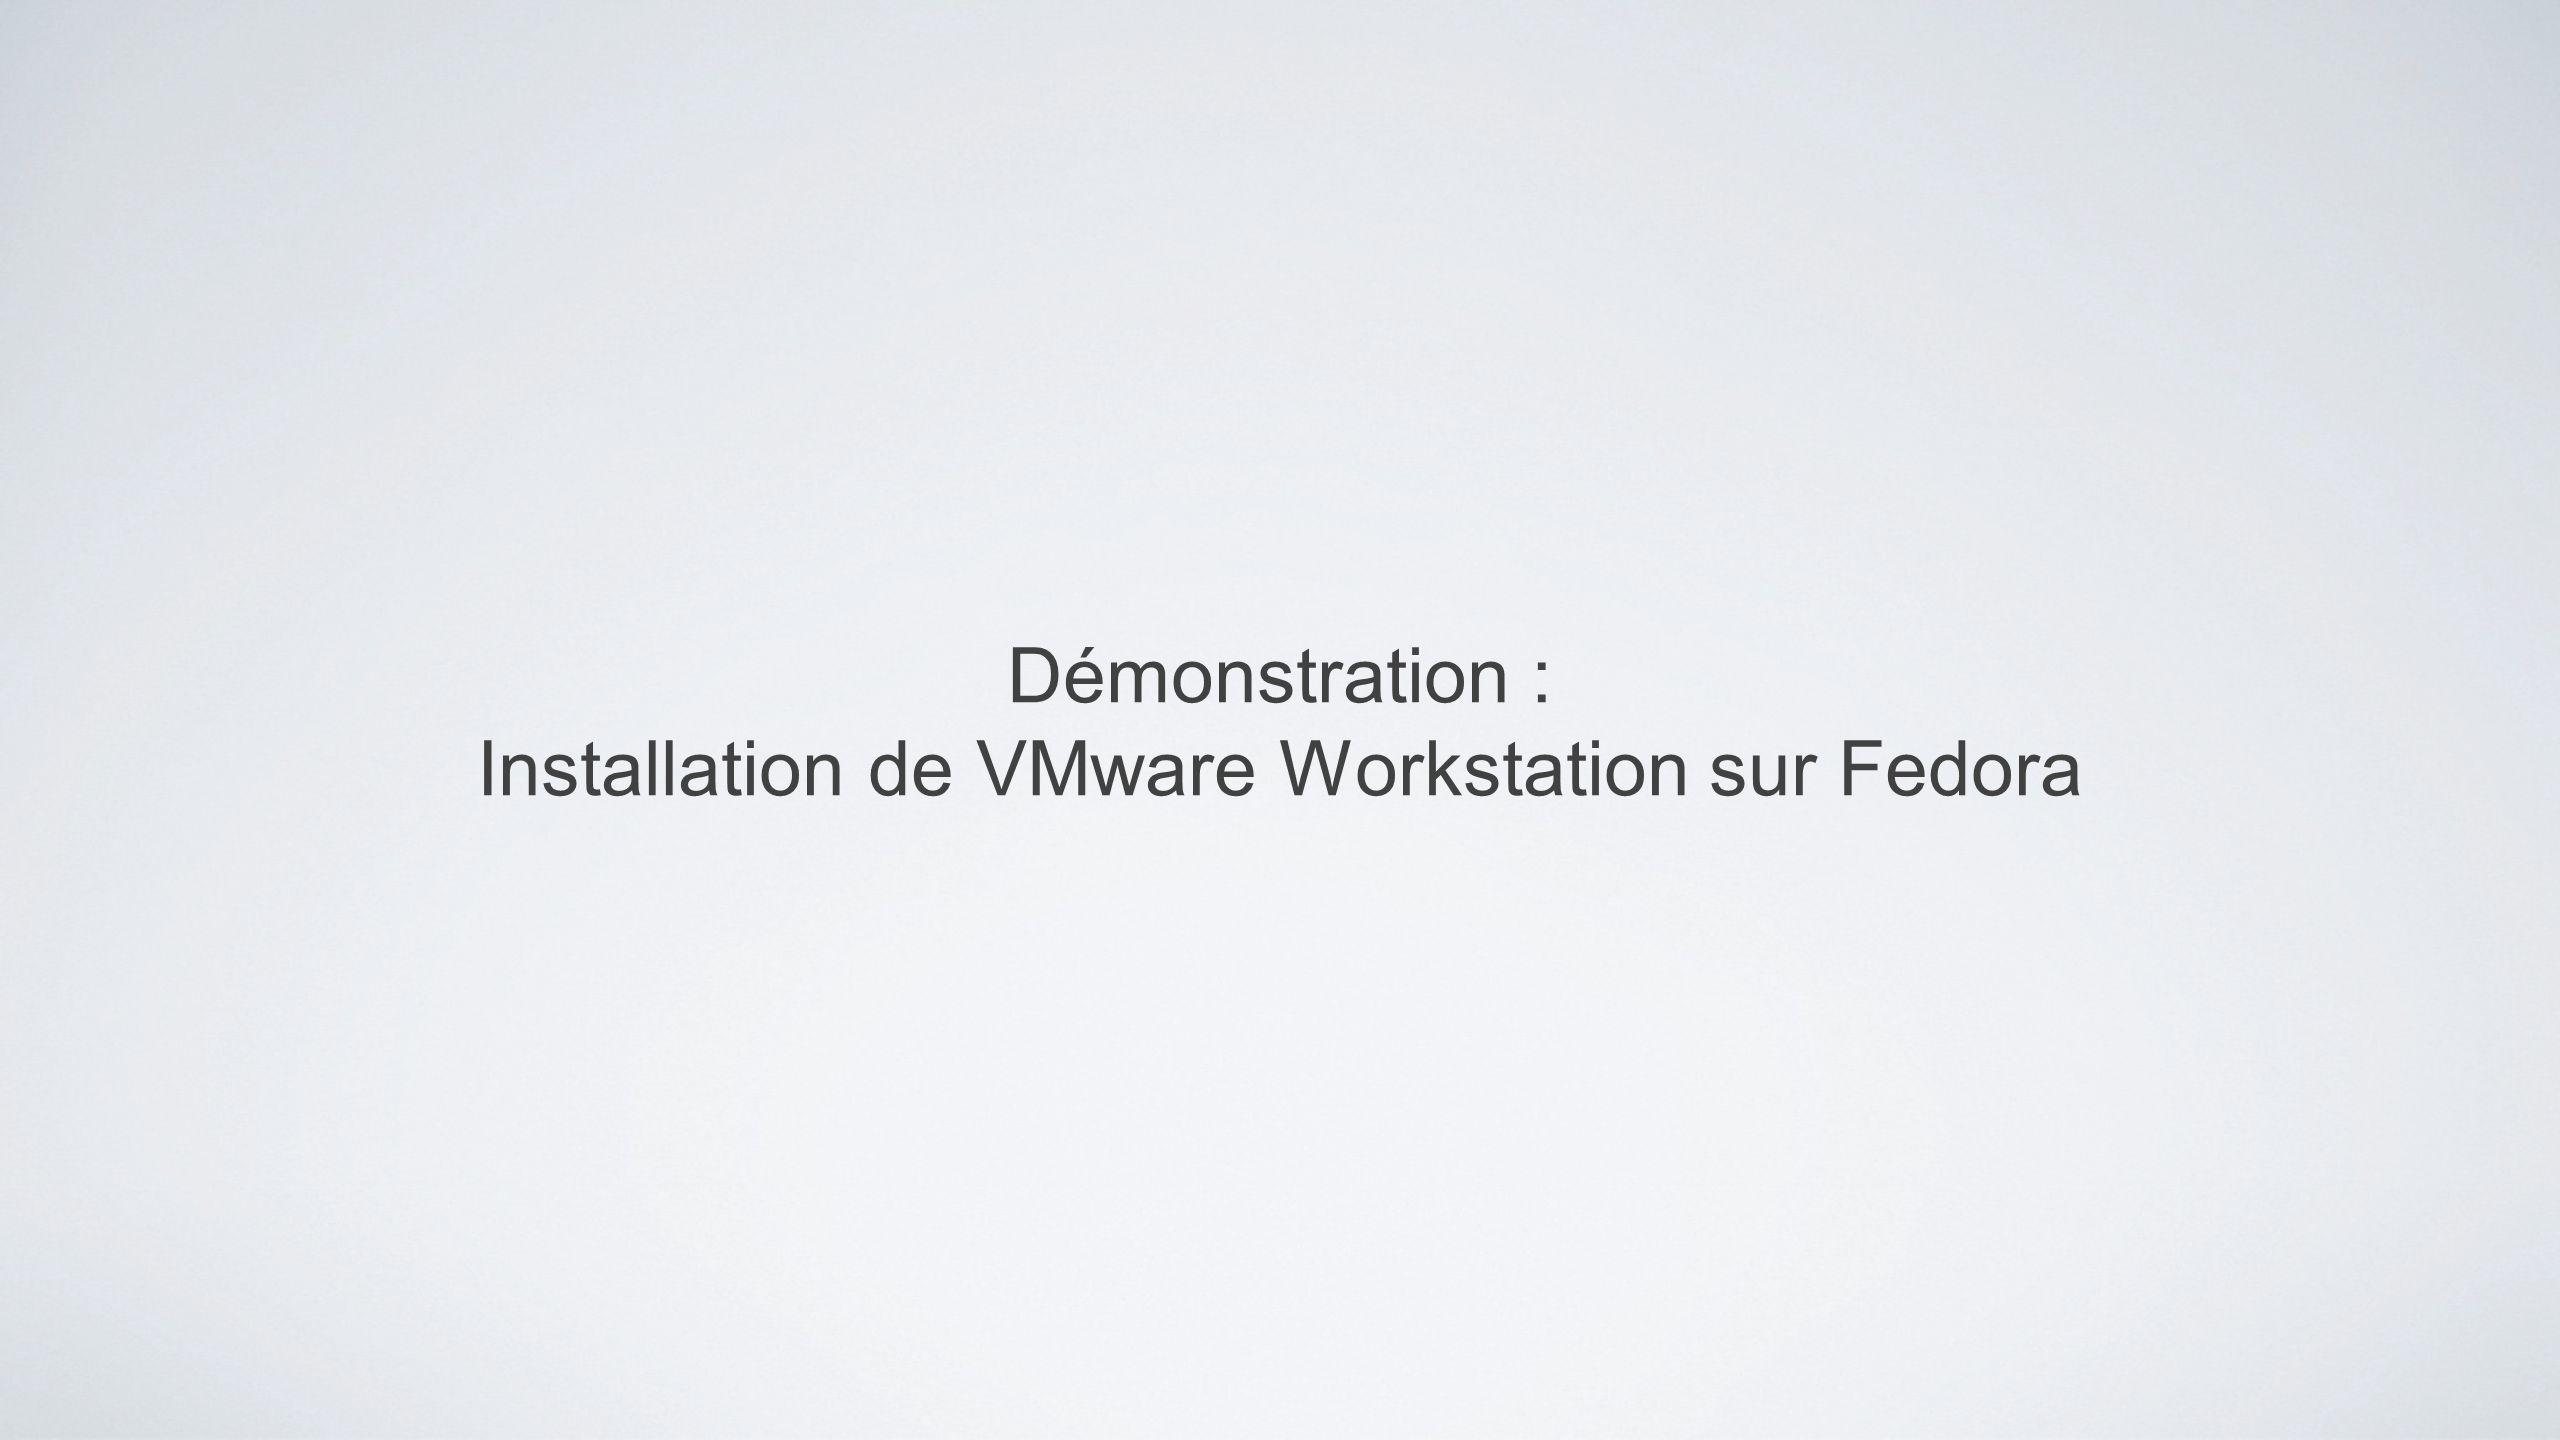 Démonstration : Installation de VMware Workstation sur Fedora